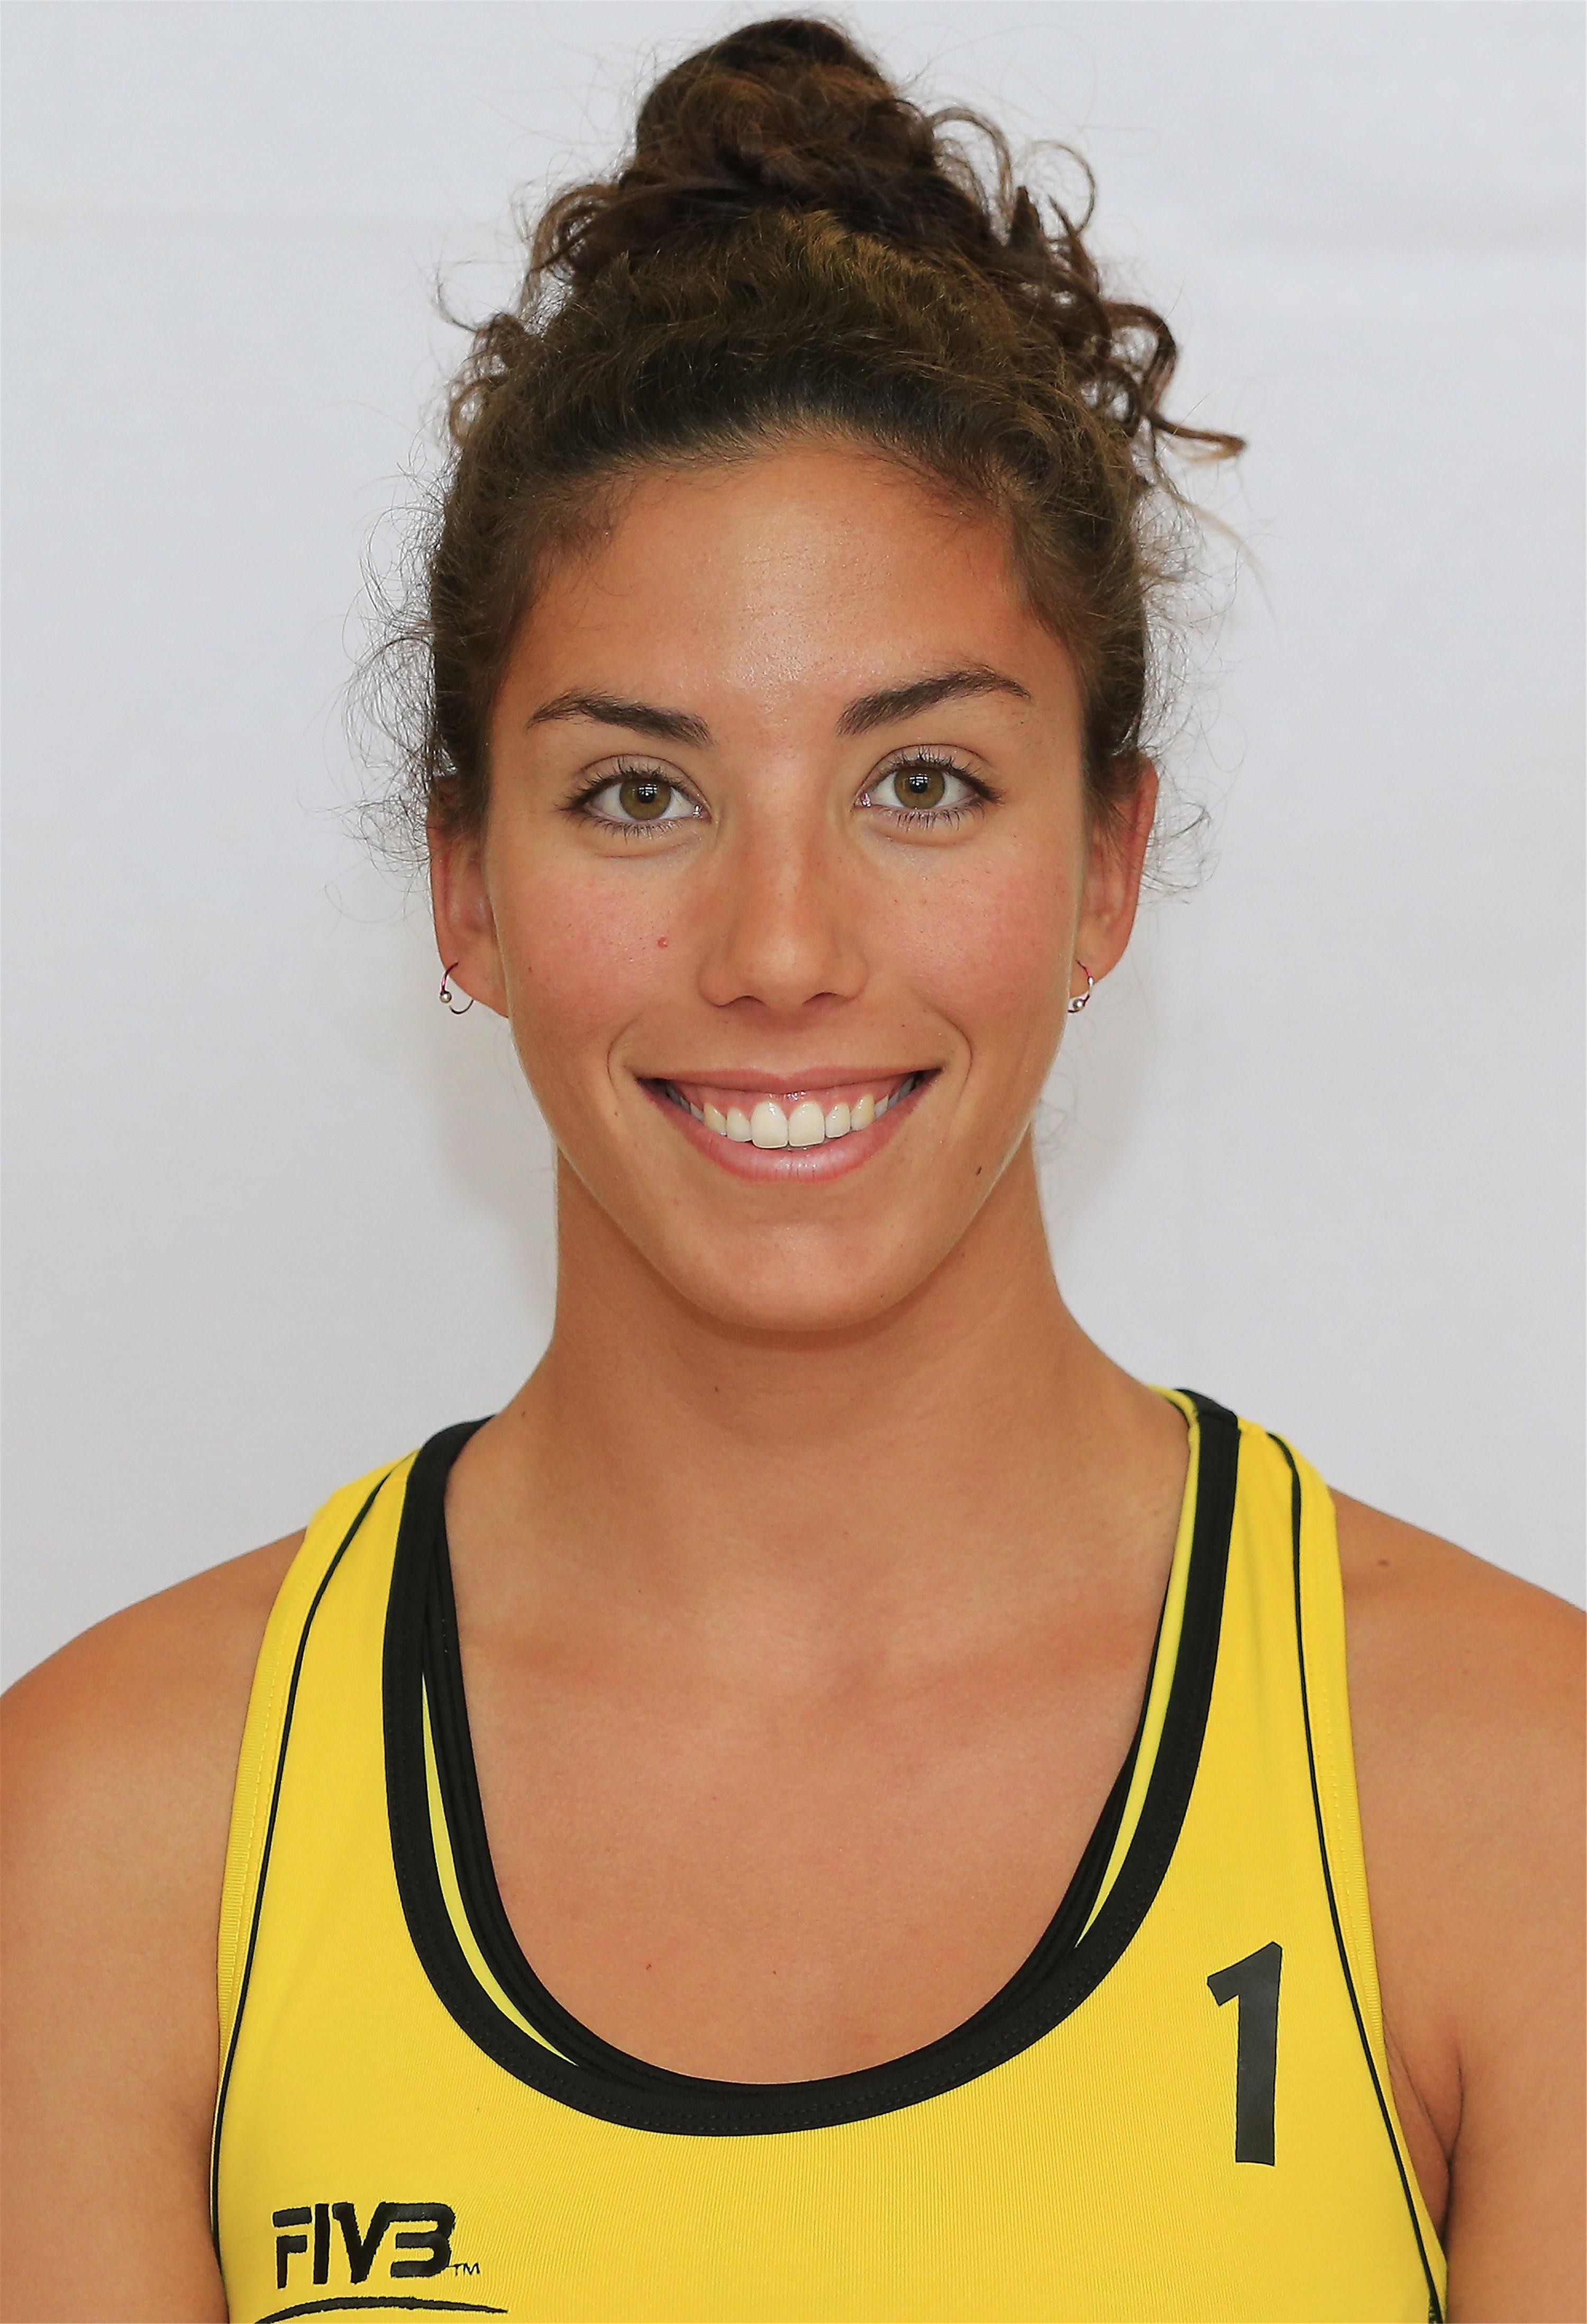 Photo of Paula SORIA GUTIÉRREZ